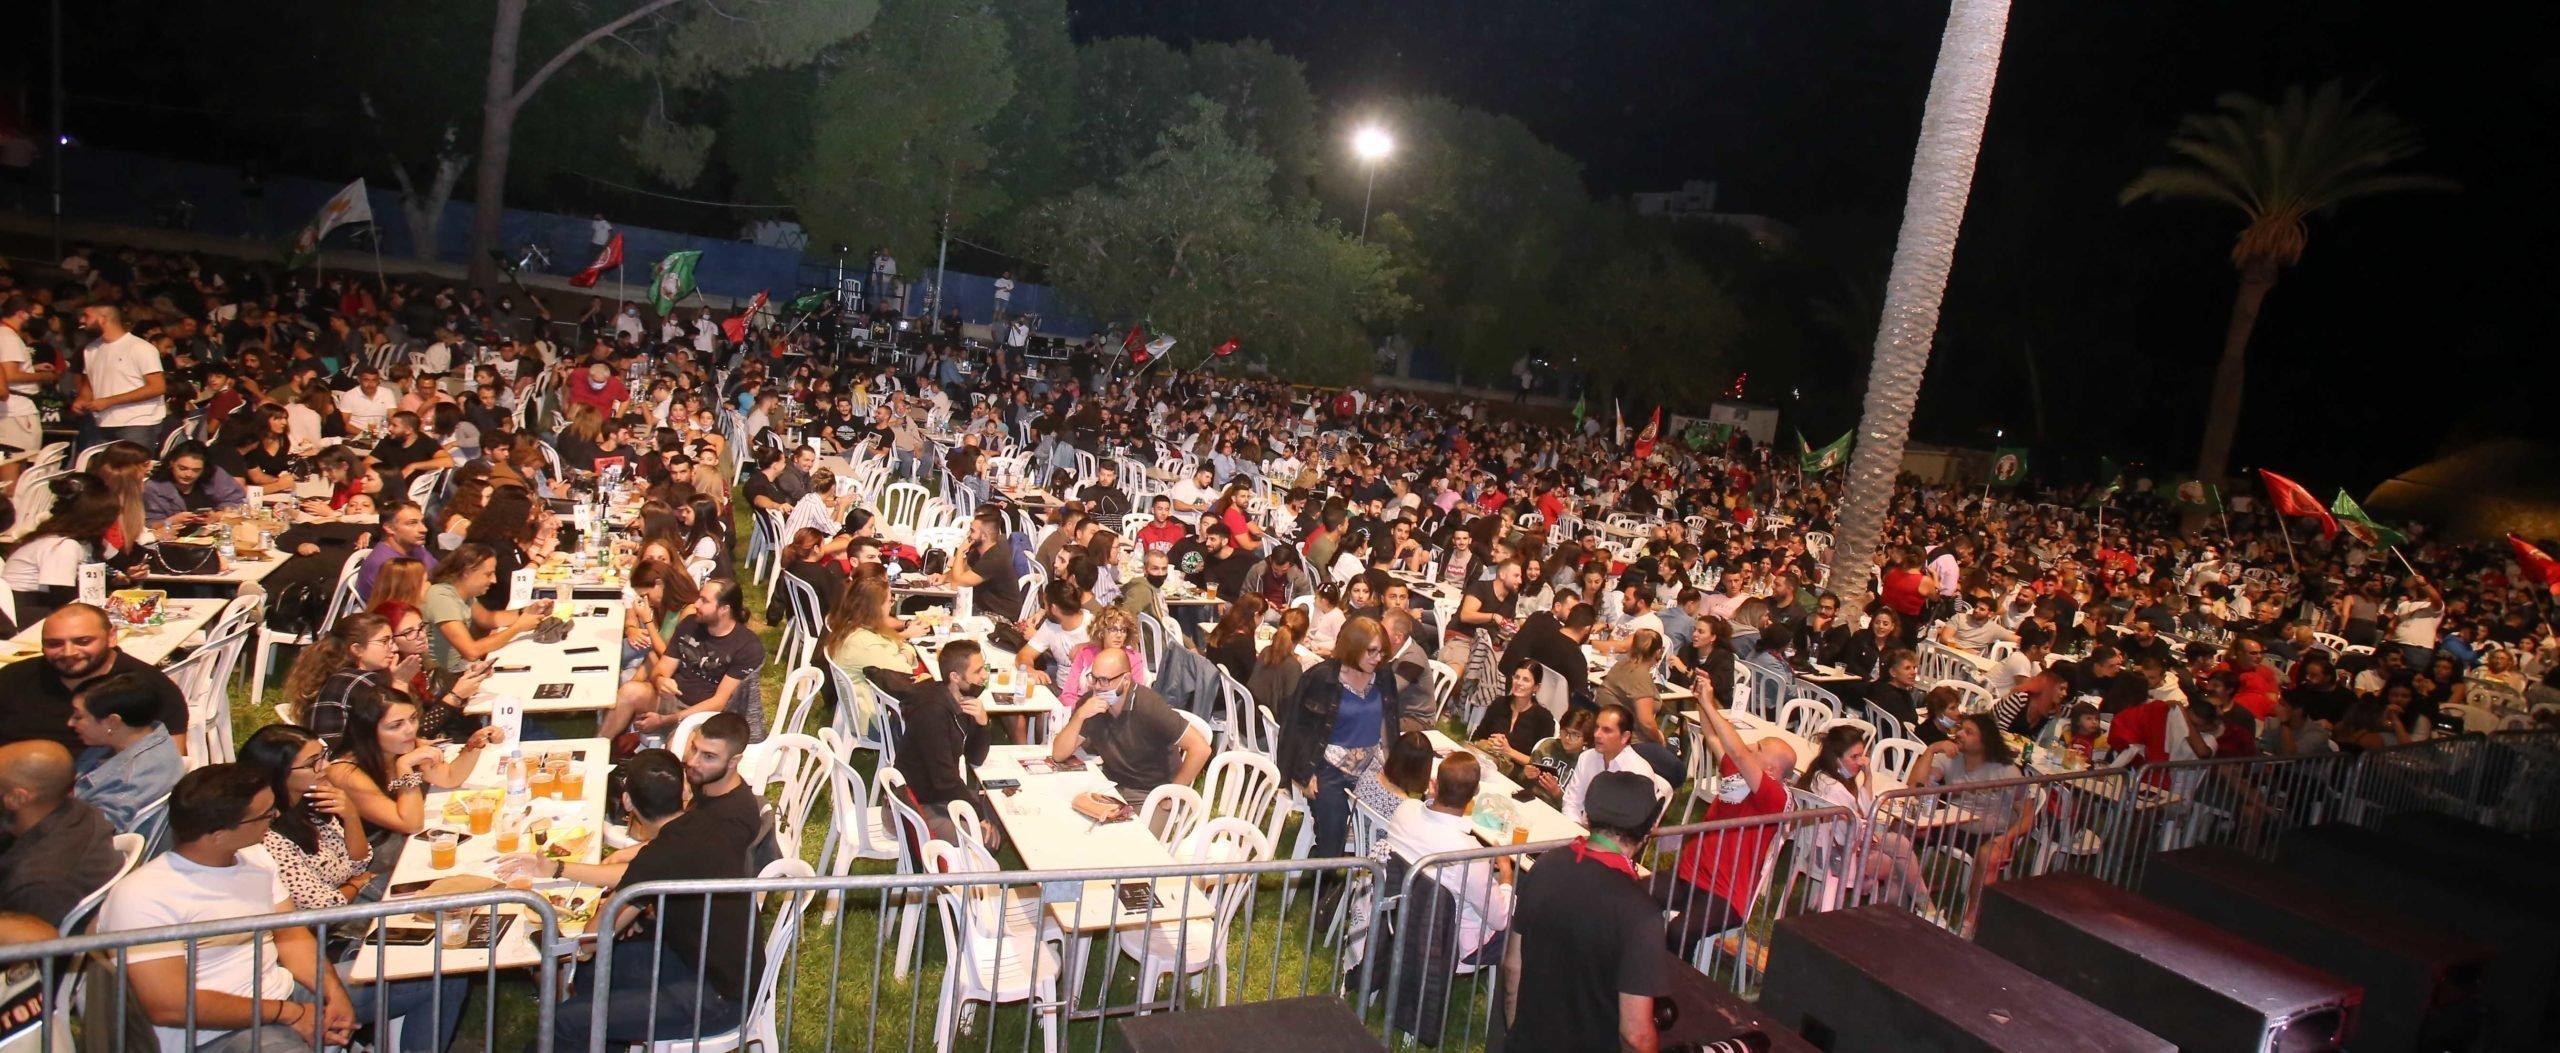 Festival Edon Stefanou Papakonstantinou 44 Scaled